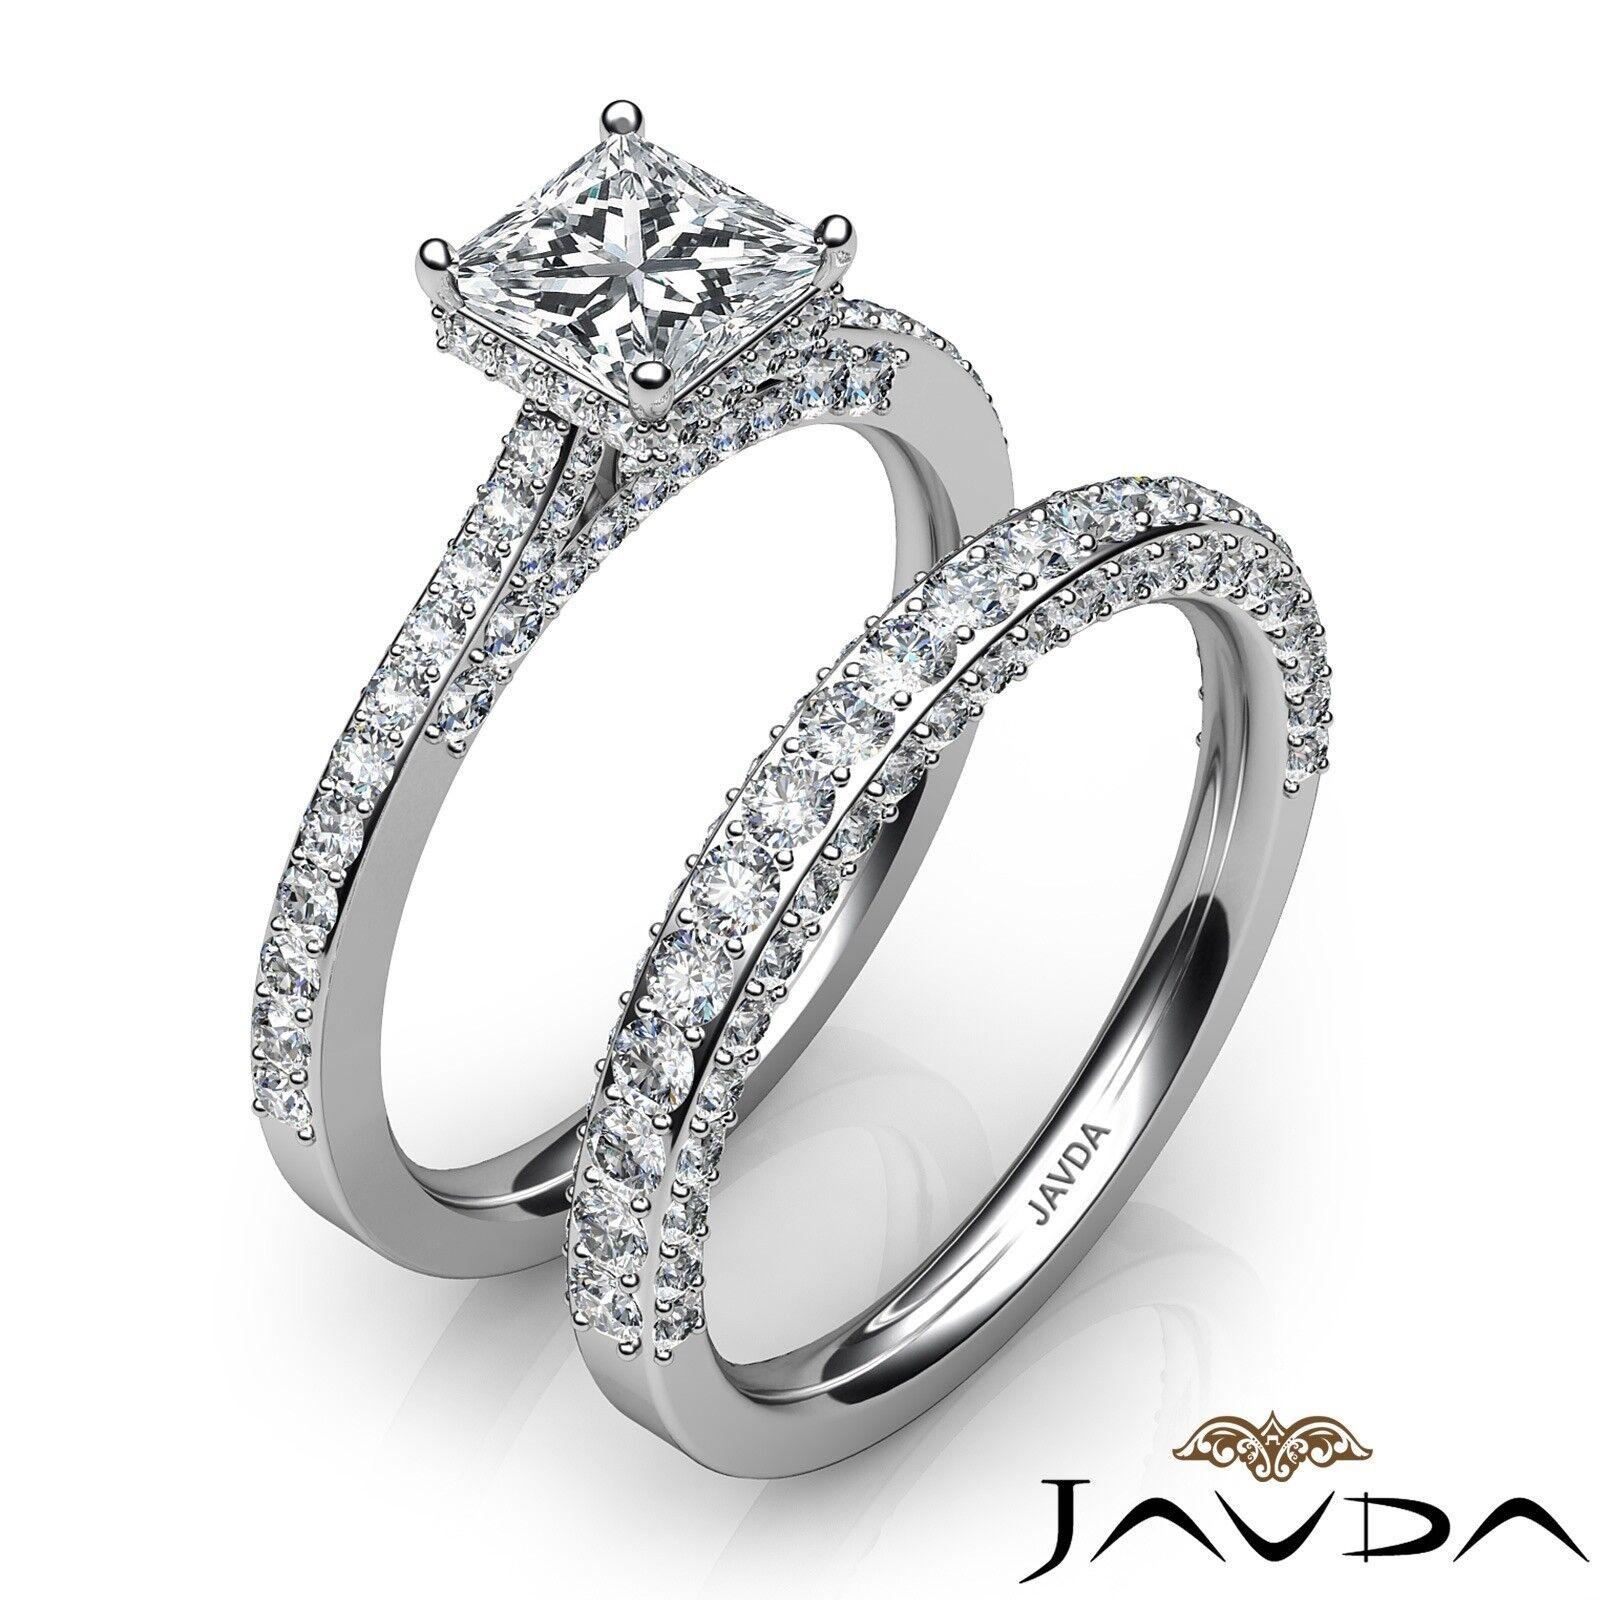 2.35ctw Circa Halo Pave Wedding Set Princess Diamond Engagement Ring GIA G-VVS1 2